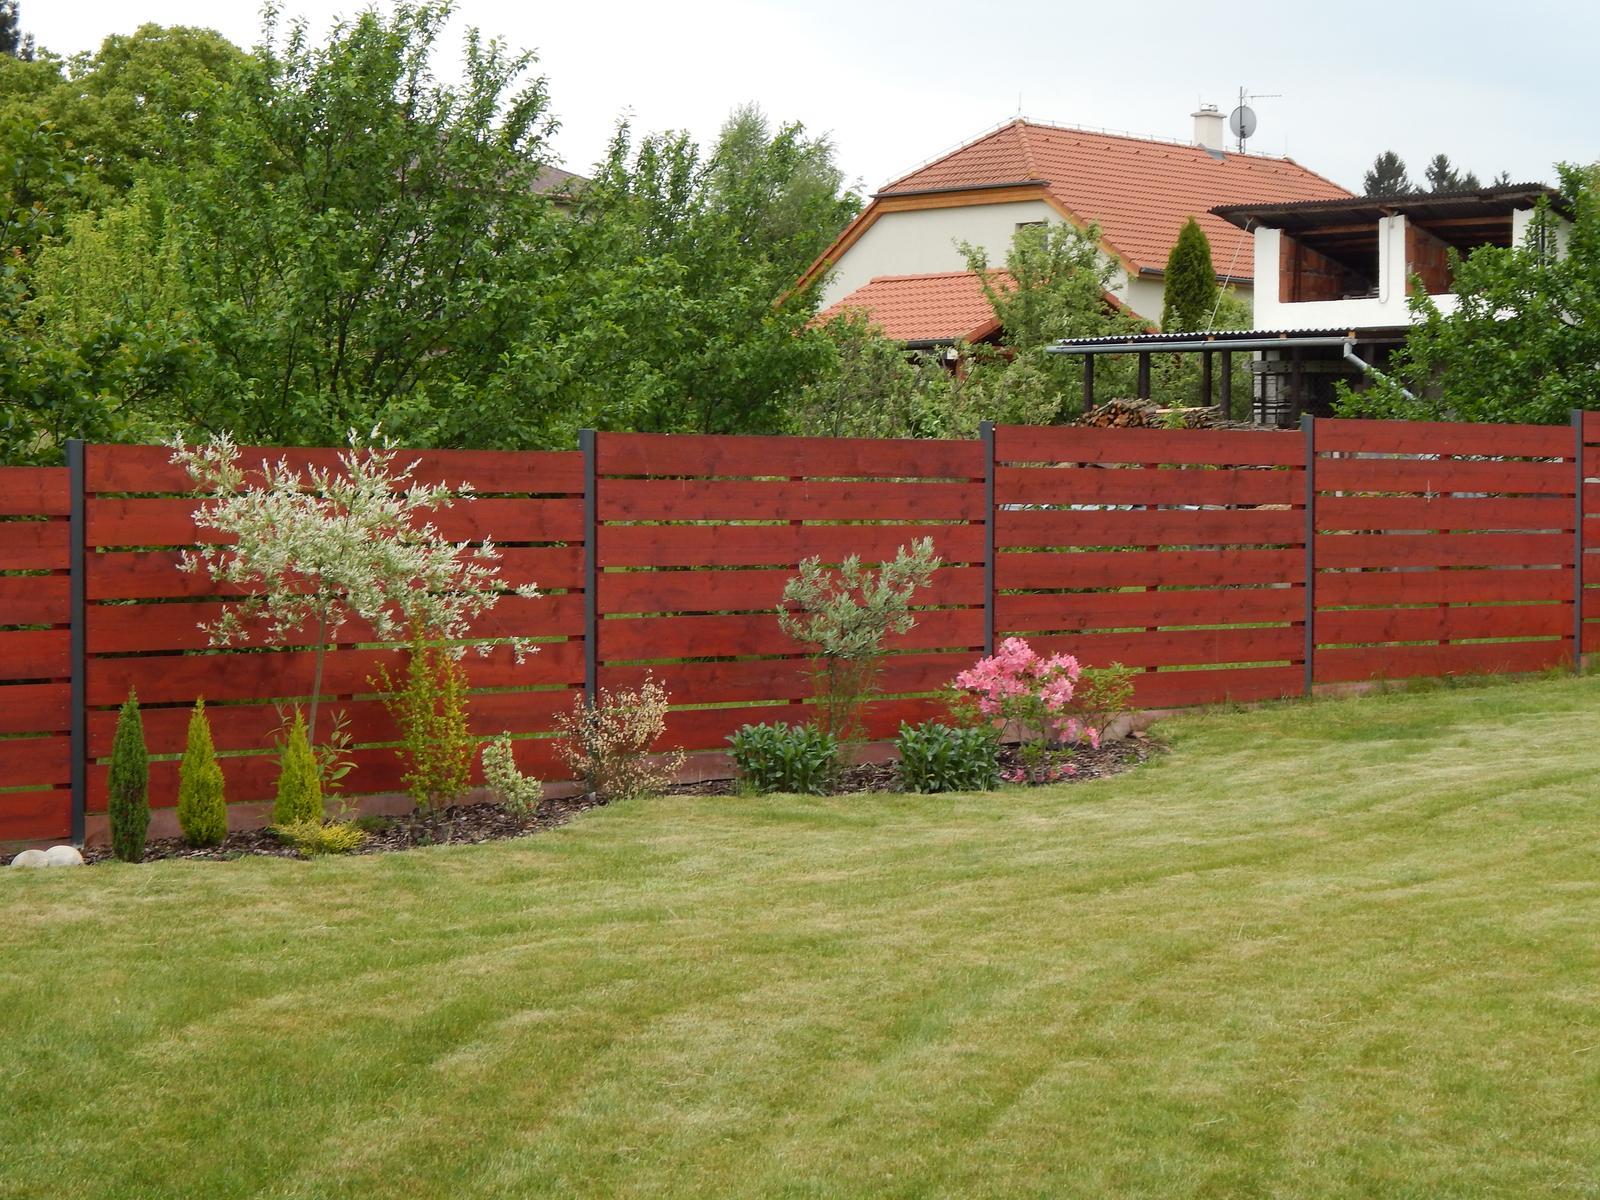 Naše zahrada - Obrázek č. 1